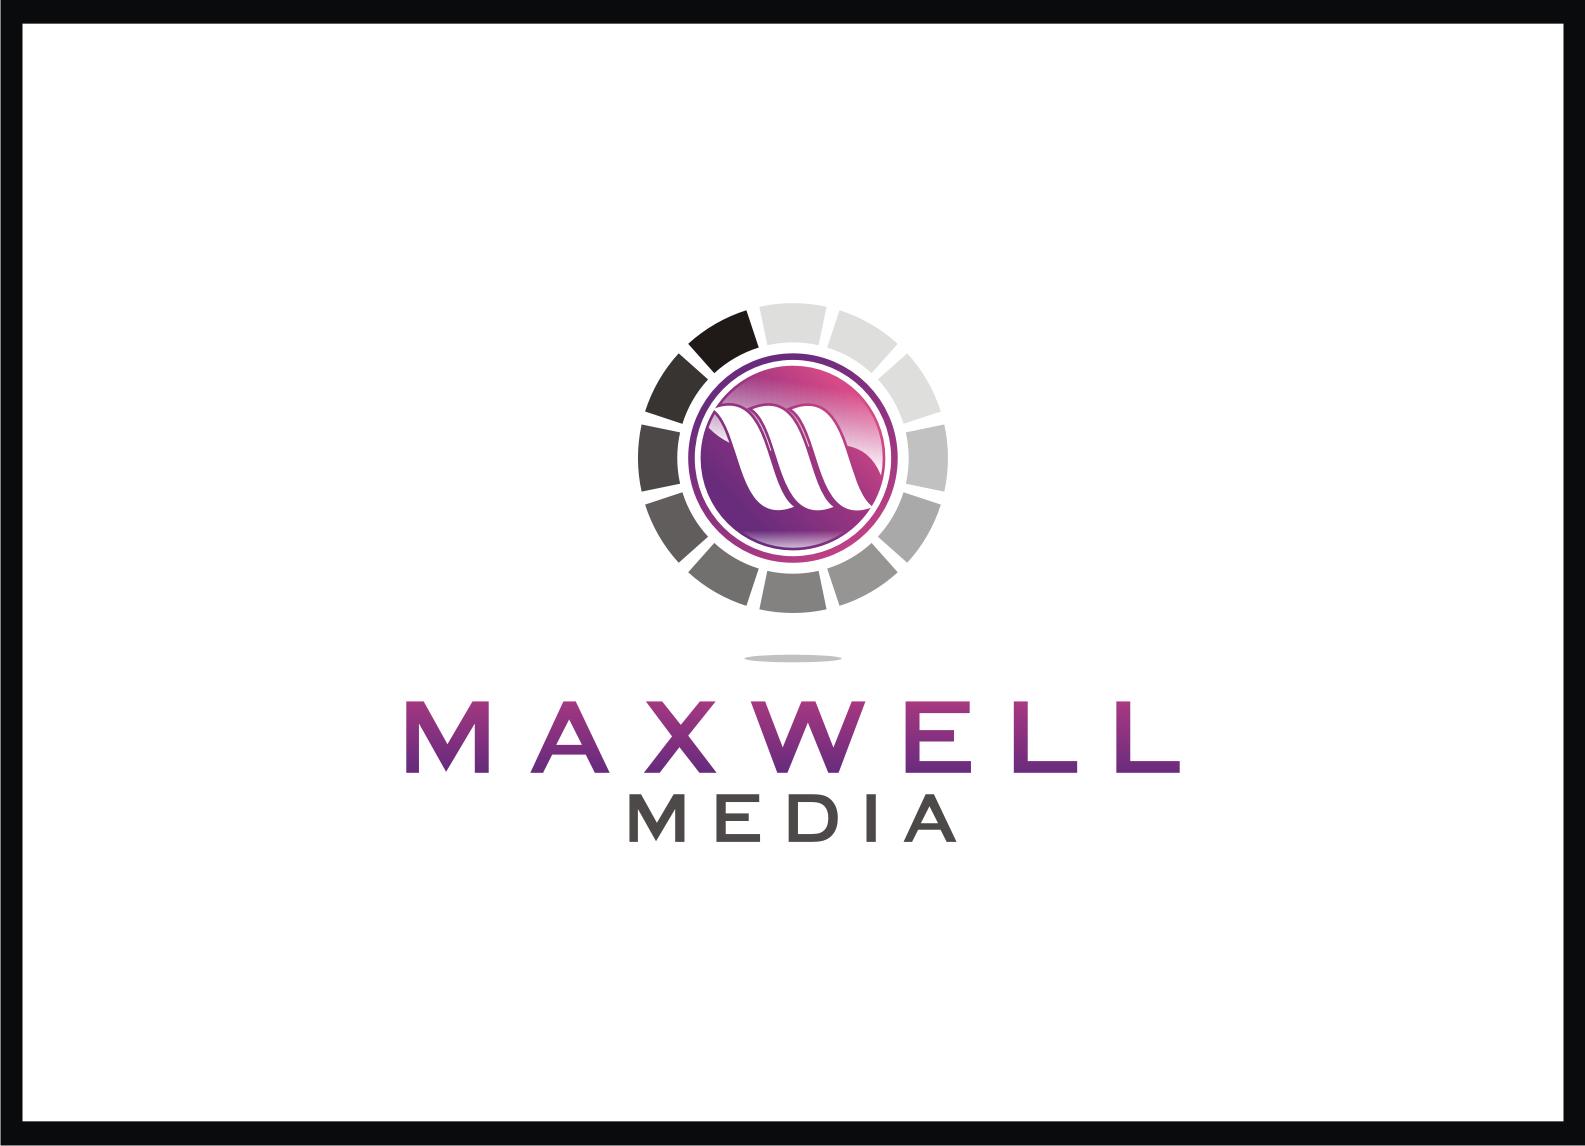 Maxwell Media needs a new logo